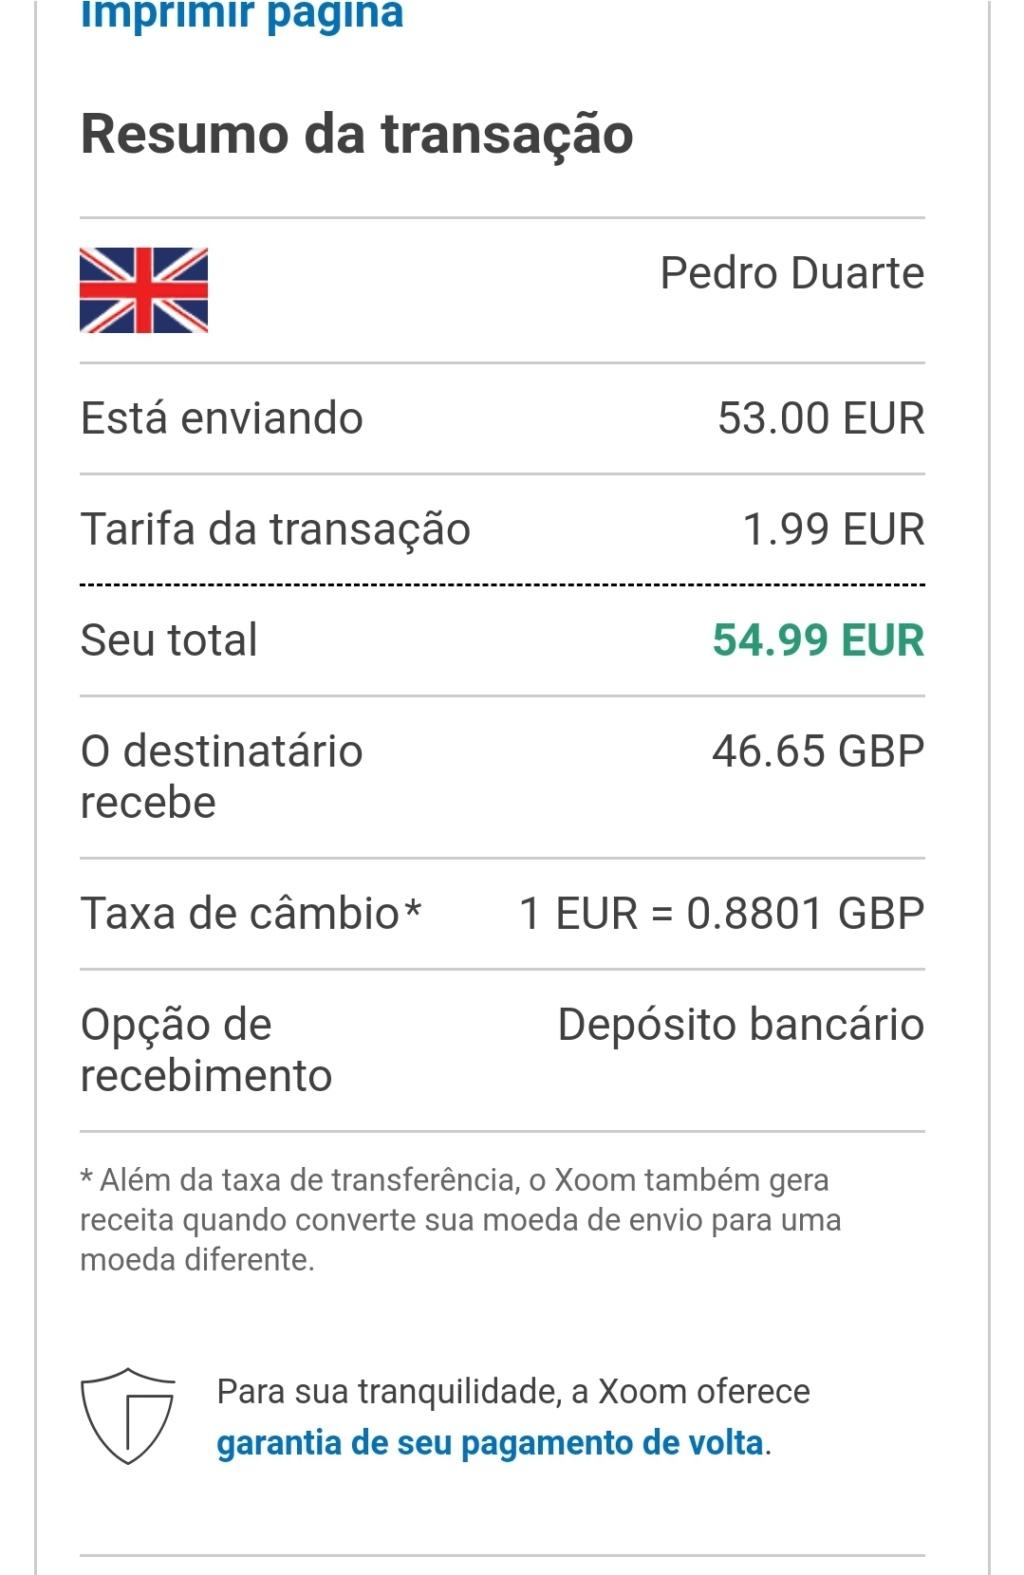 OPORTUNIDADE [Provado] - Ganha 25€ Paypal por registar na Xoom (empresaPaypal) - Página 2 Screen53